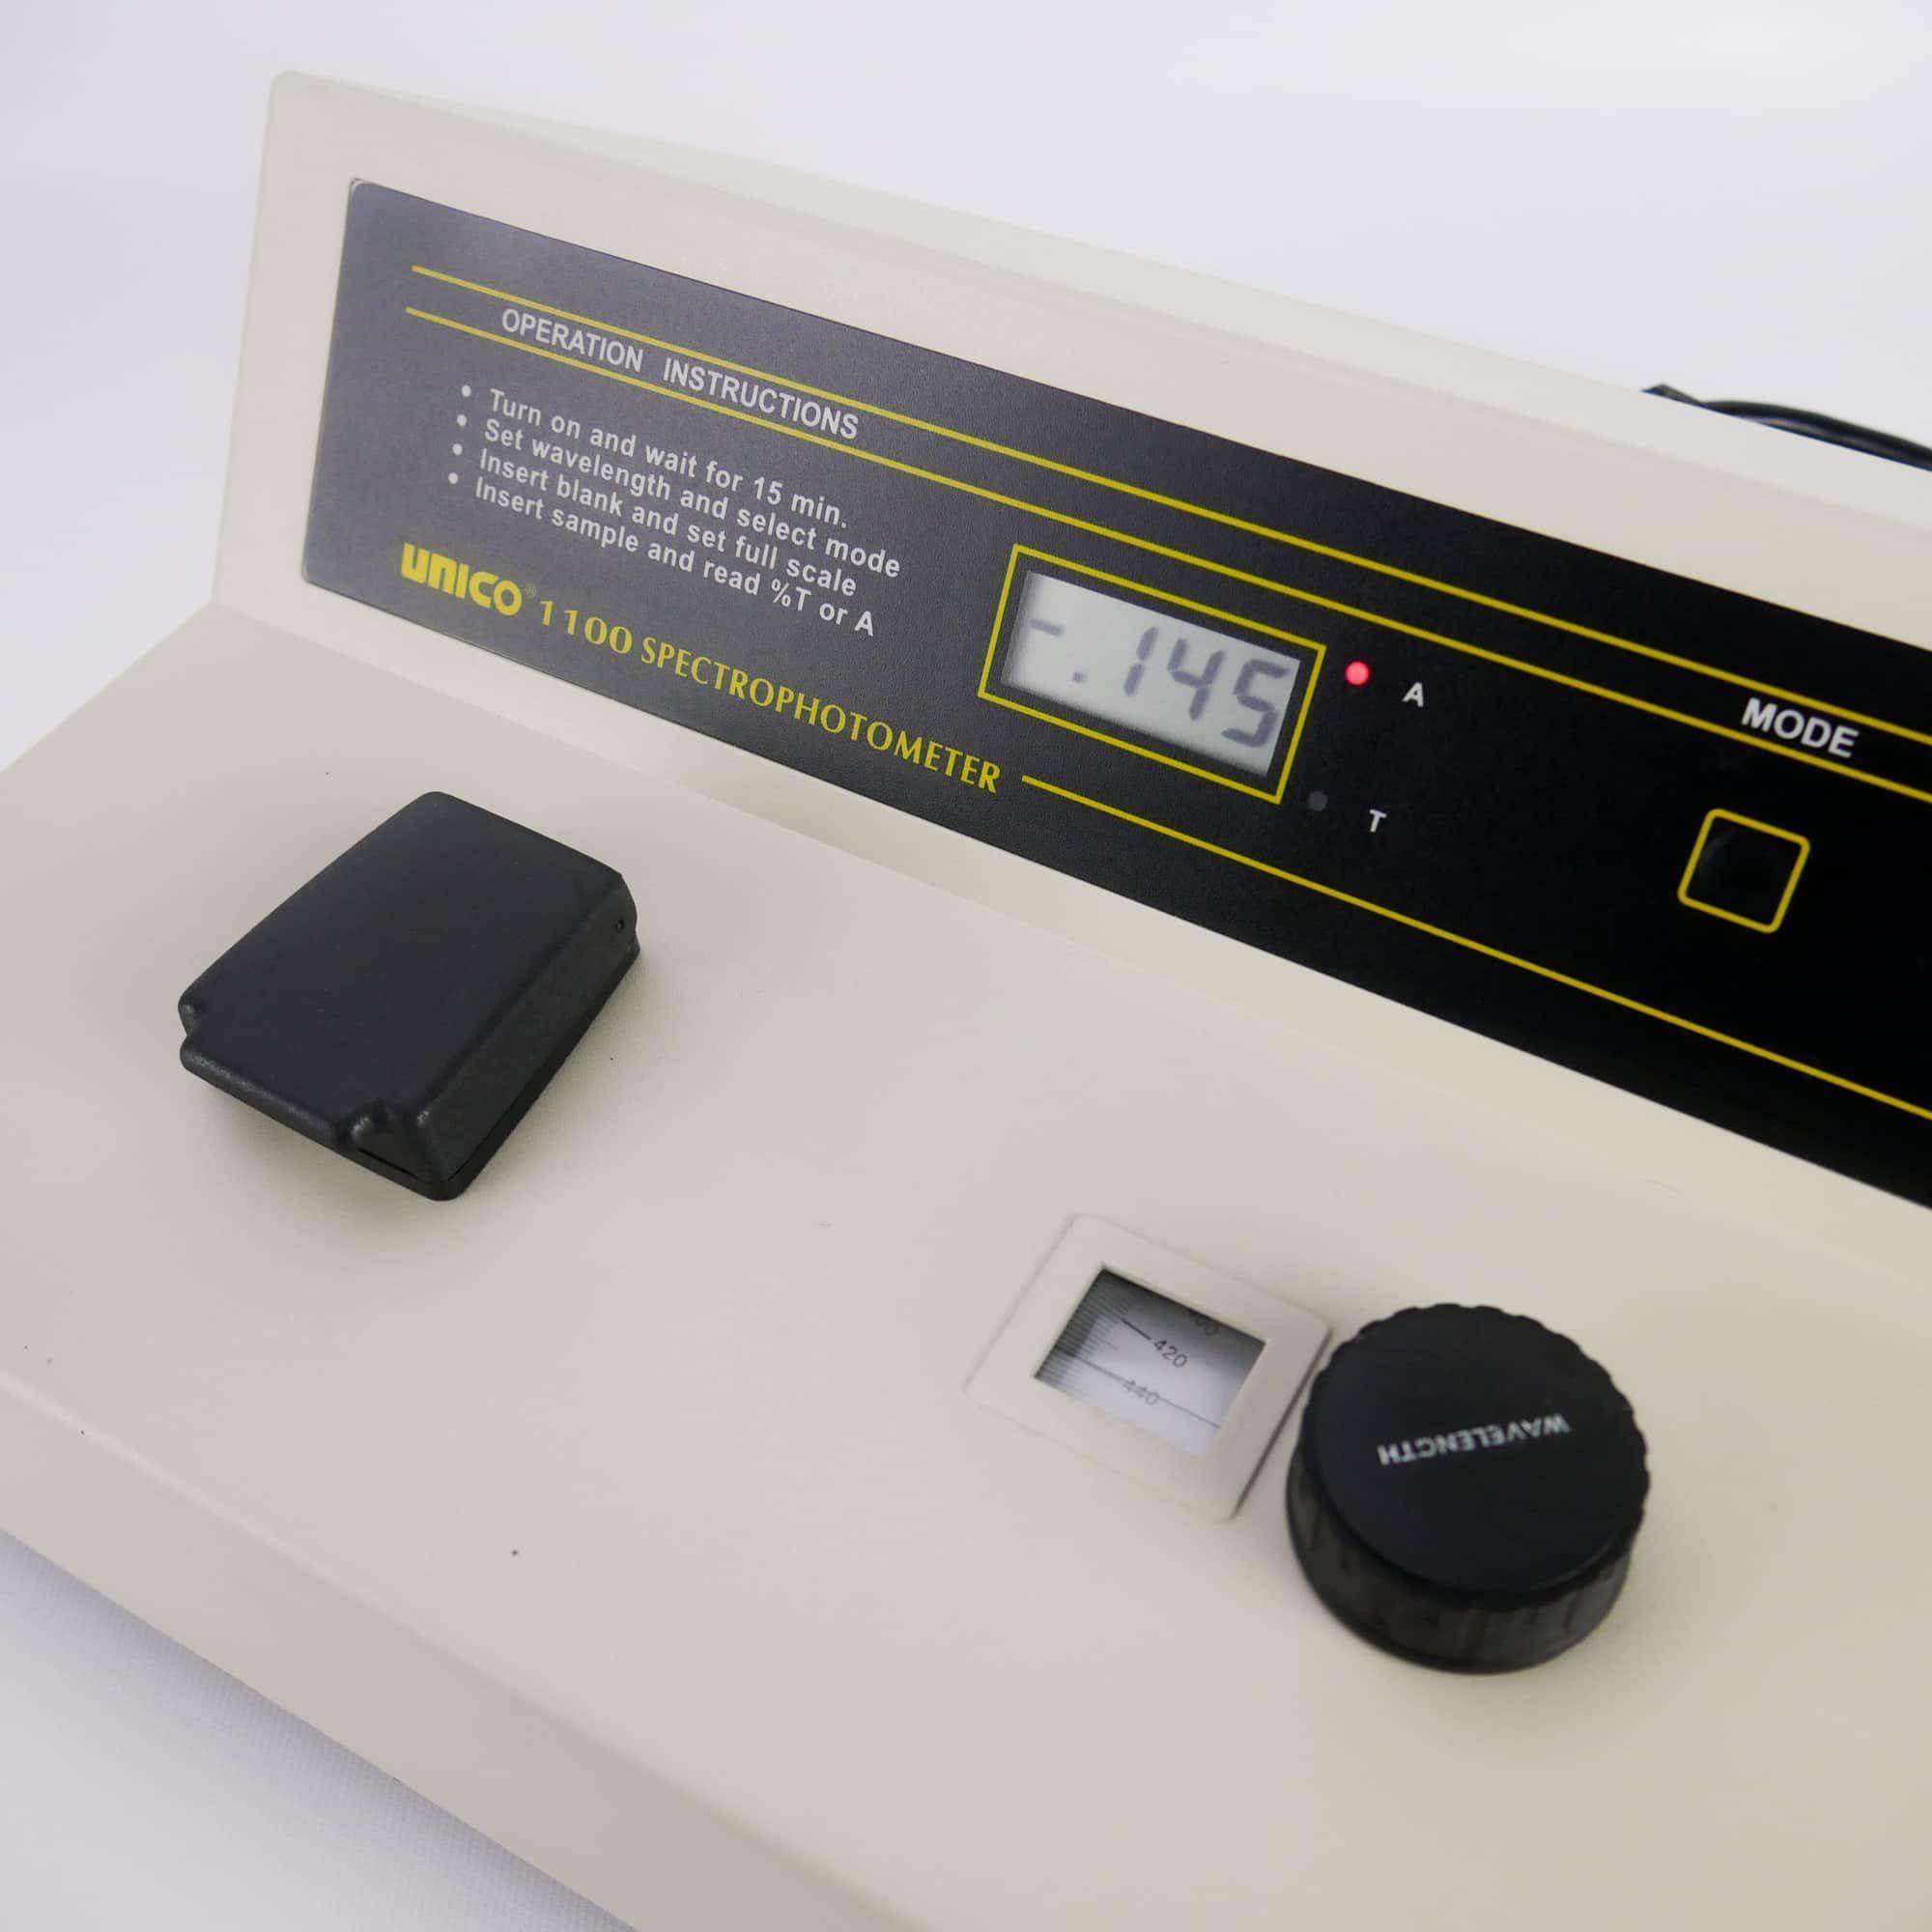 UNICO Model 1100 Spectrophotometer